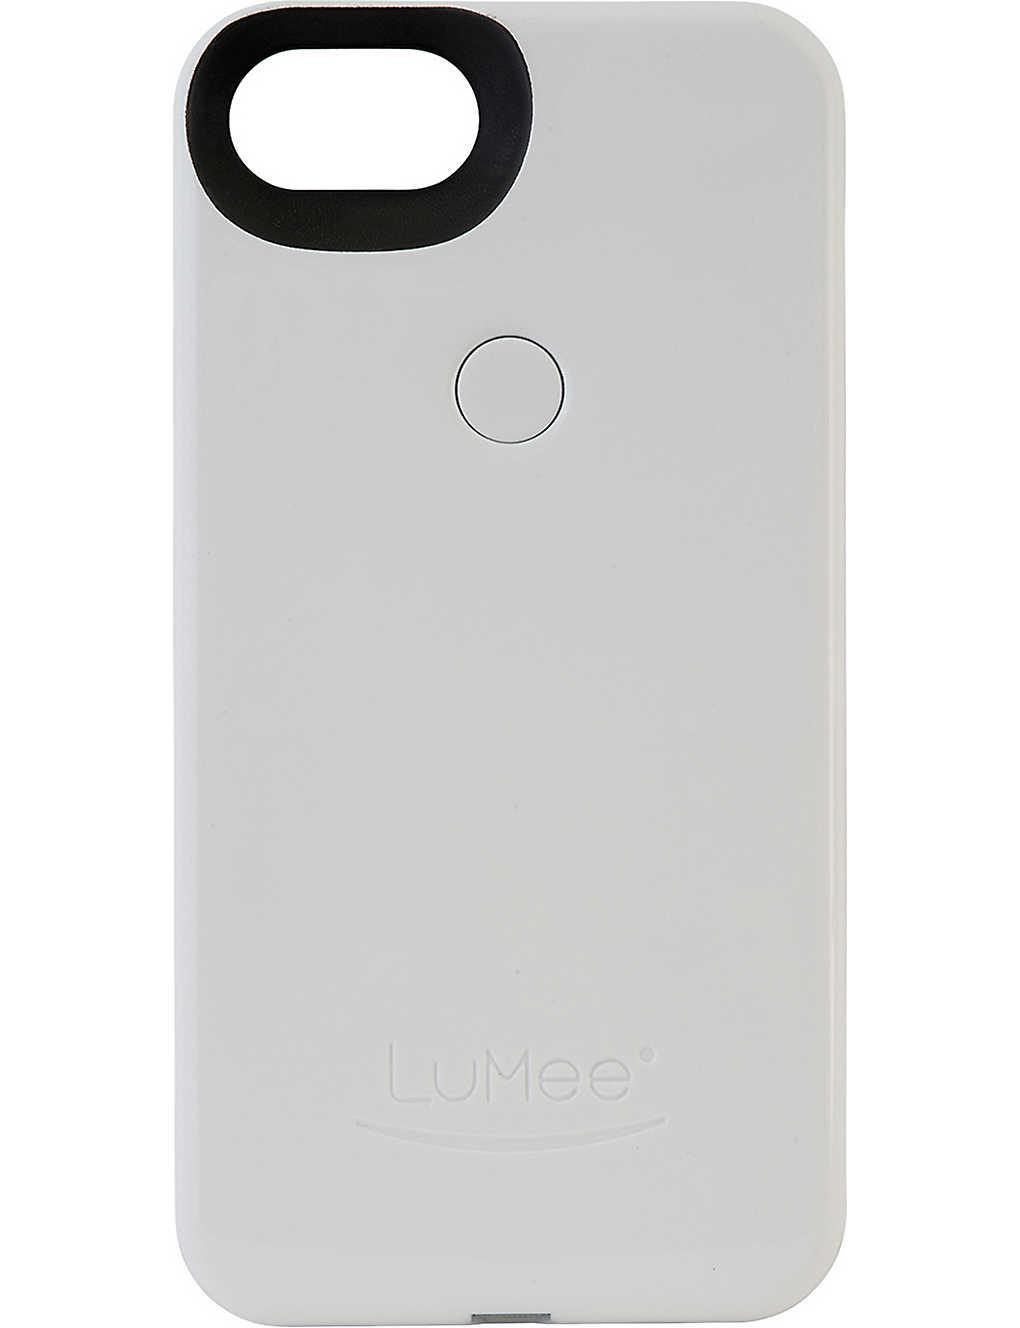 sports shoes 47849 8cbae LUMEE - LuMee Two iPhone 7 Plus case | Selfridges.com